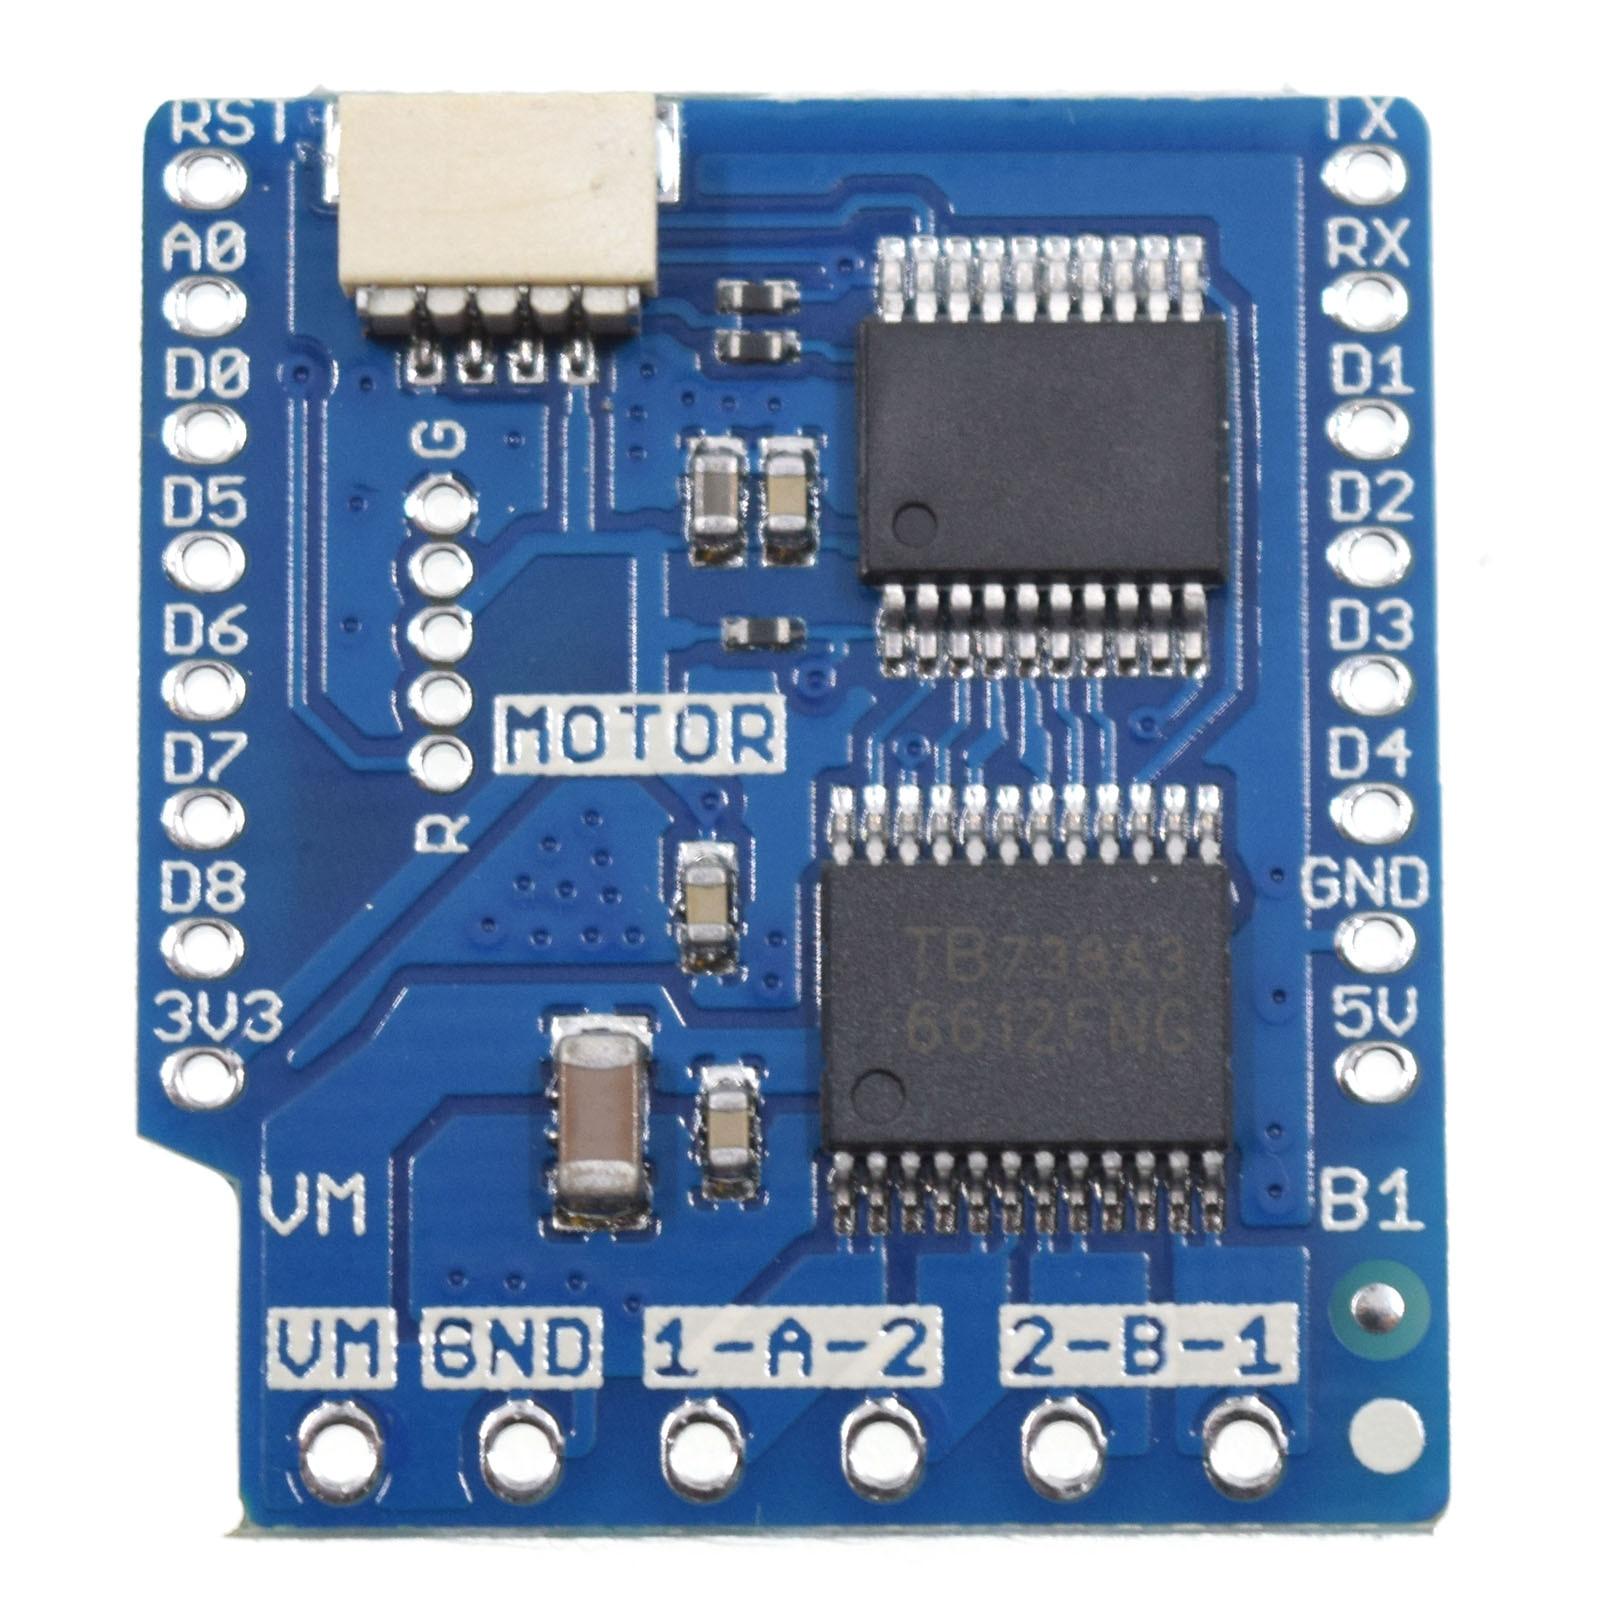 Motor Shield v2.0.0 For LOLIN (WEMOS) D1 mini I2C Dual Motor Driver TB6612FNG (1A) V1.0.0